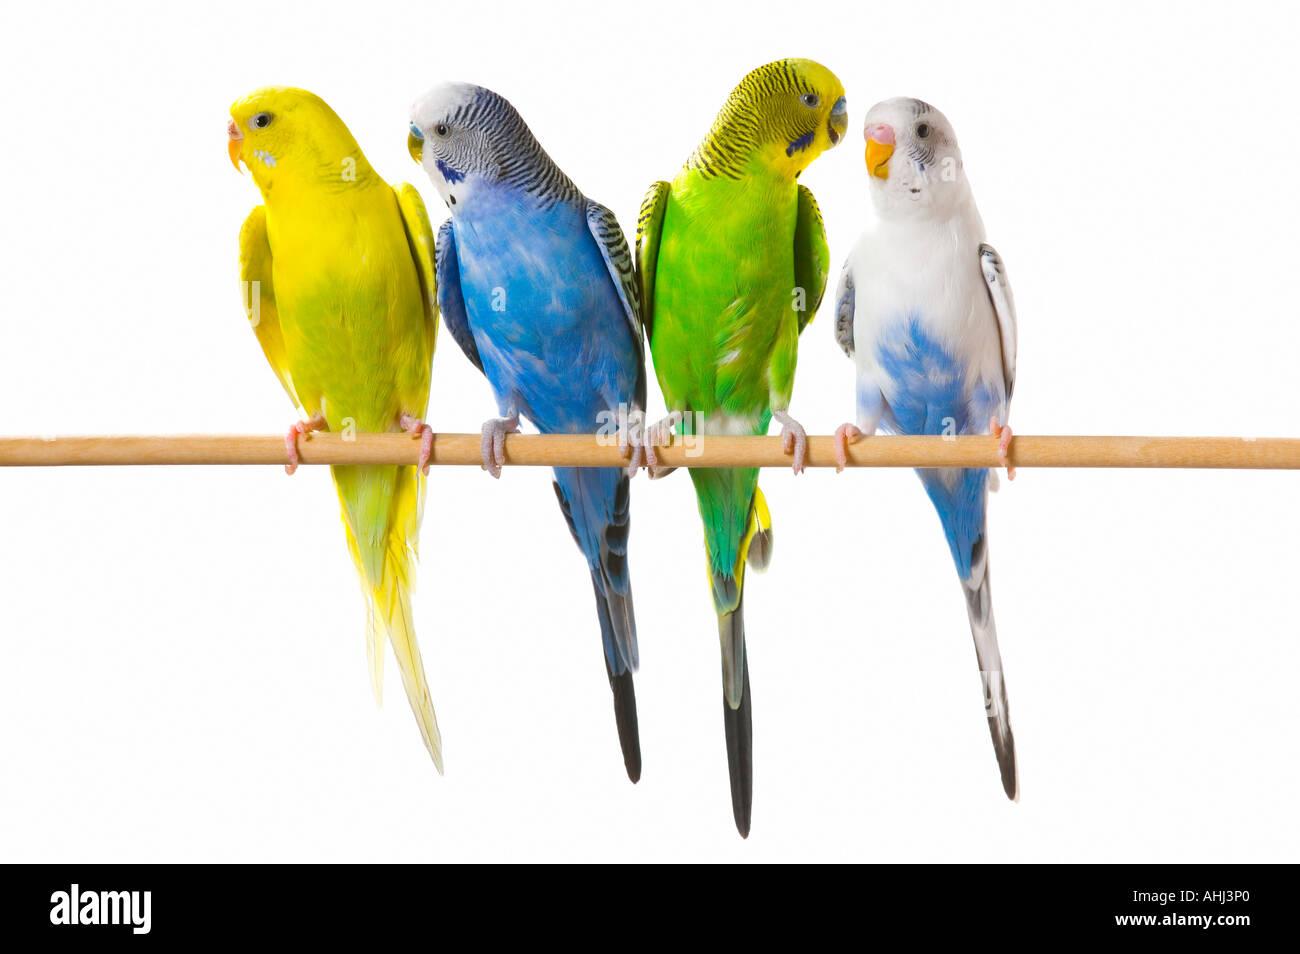 Budgie birds on a perch